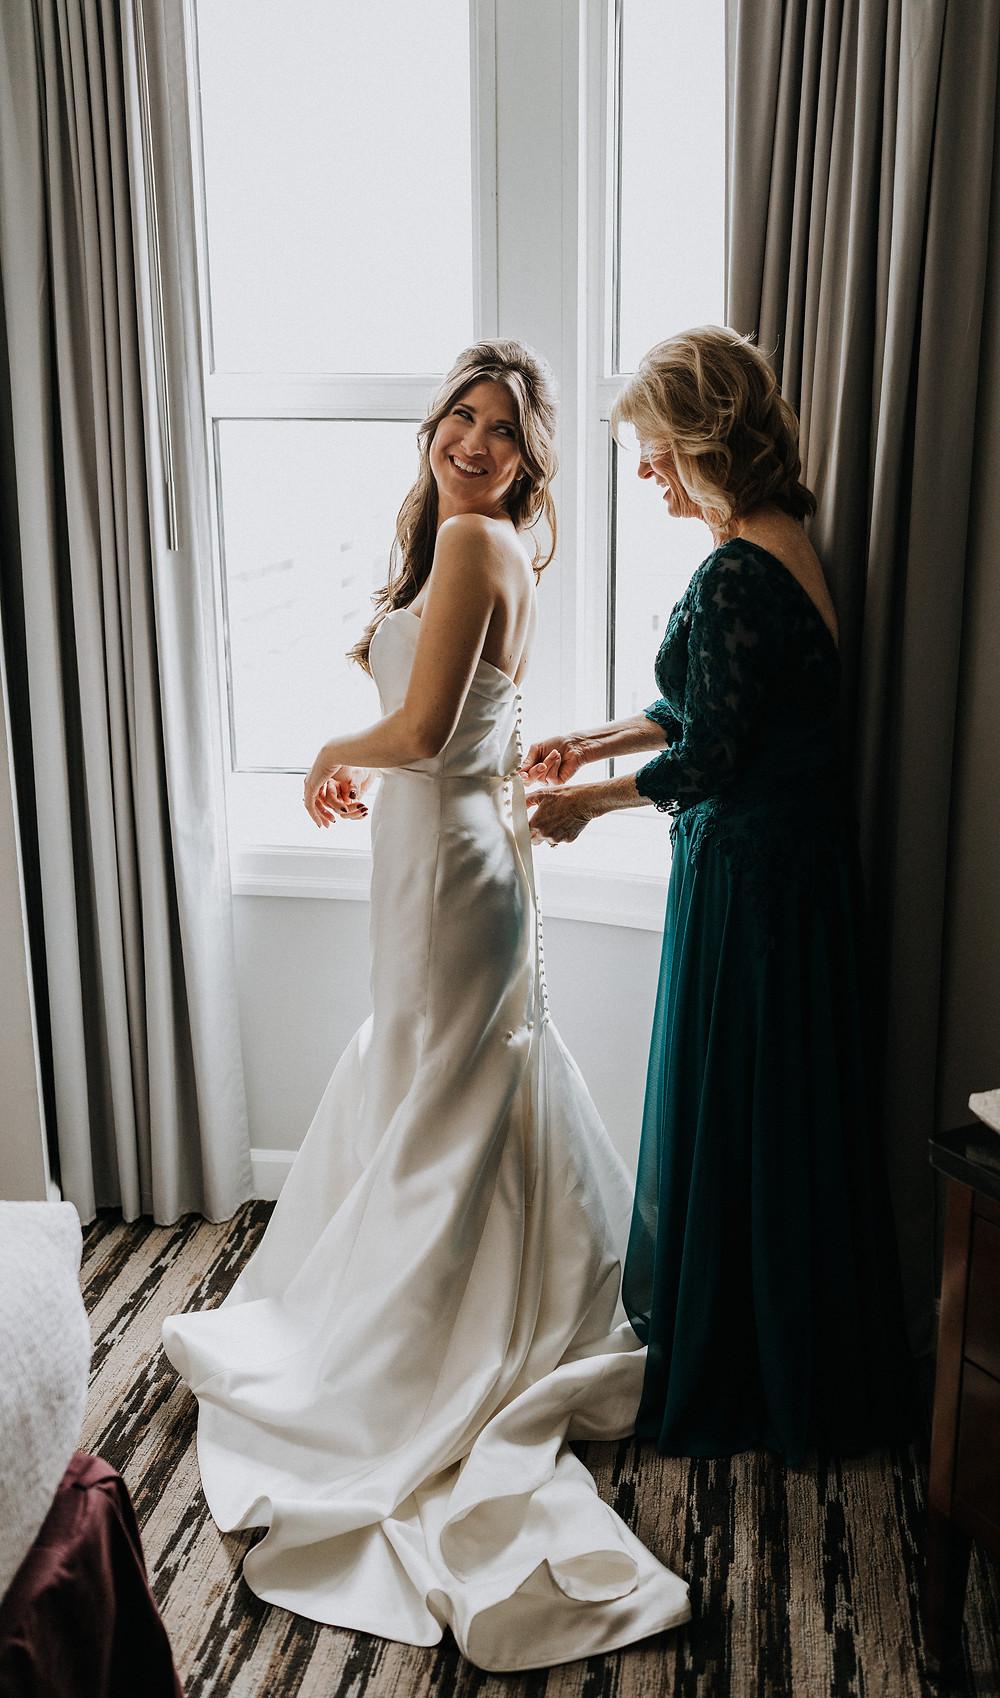 Mom zipping us wedding dress